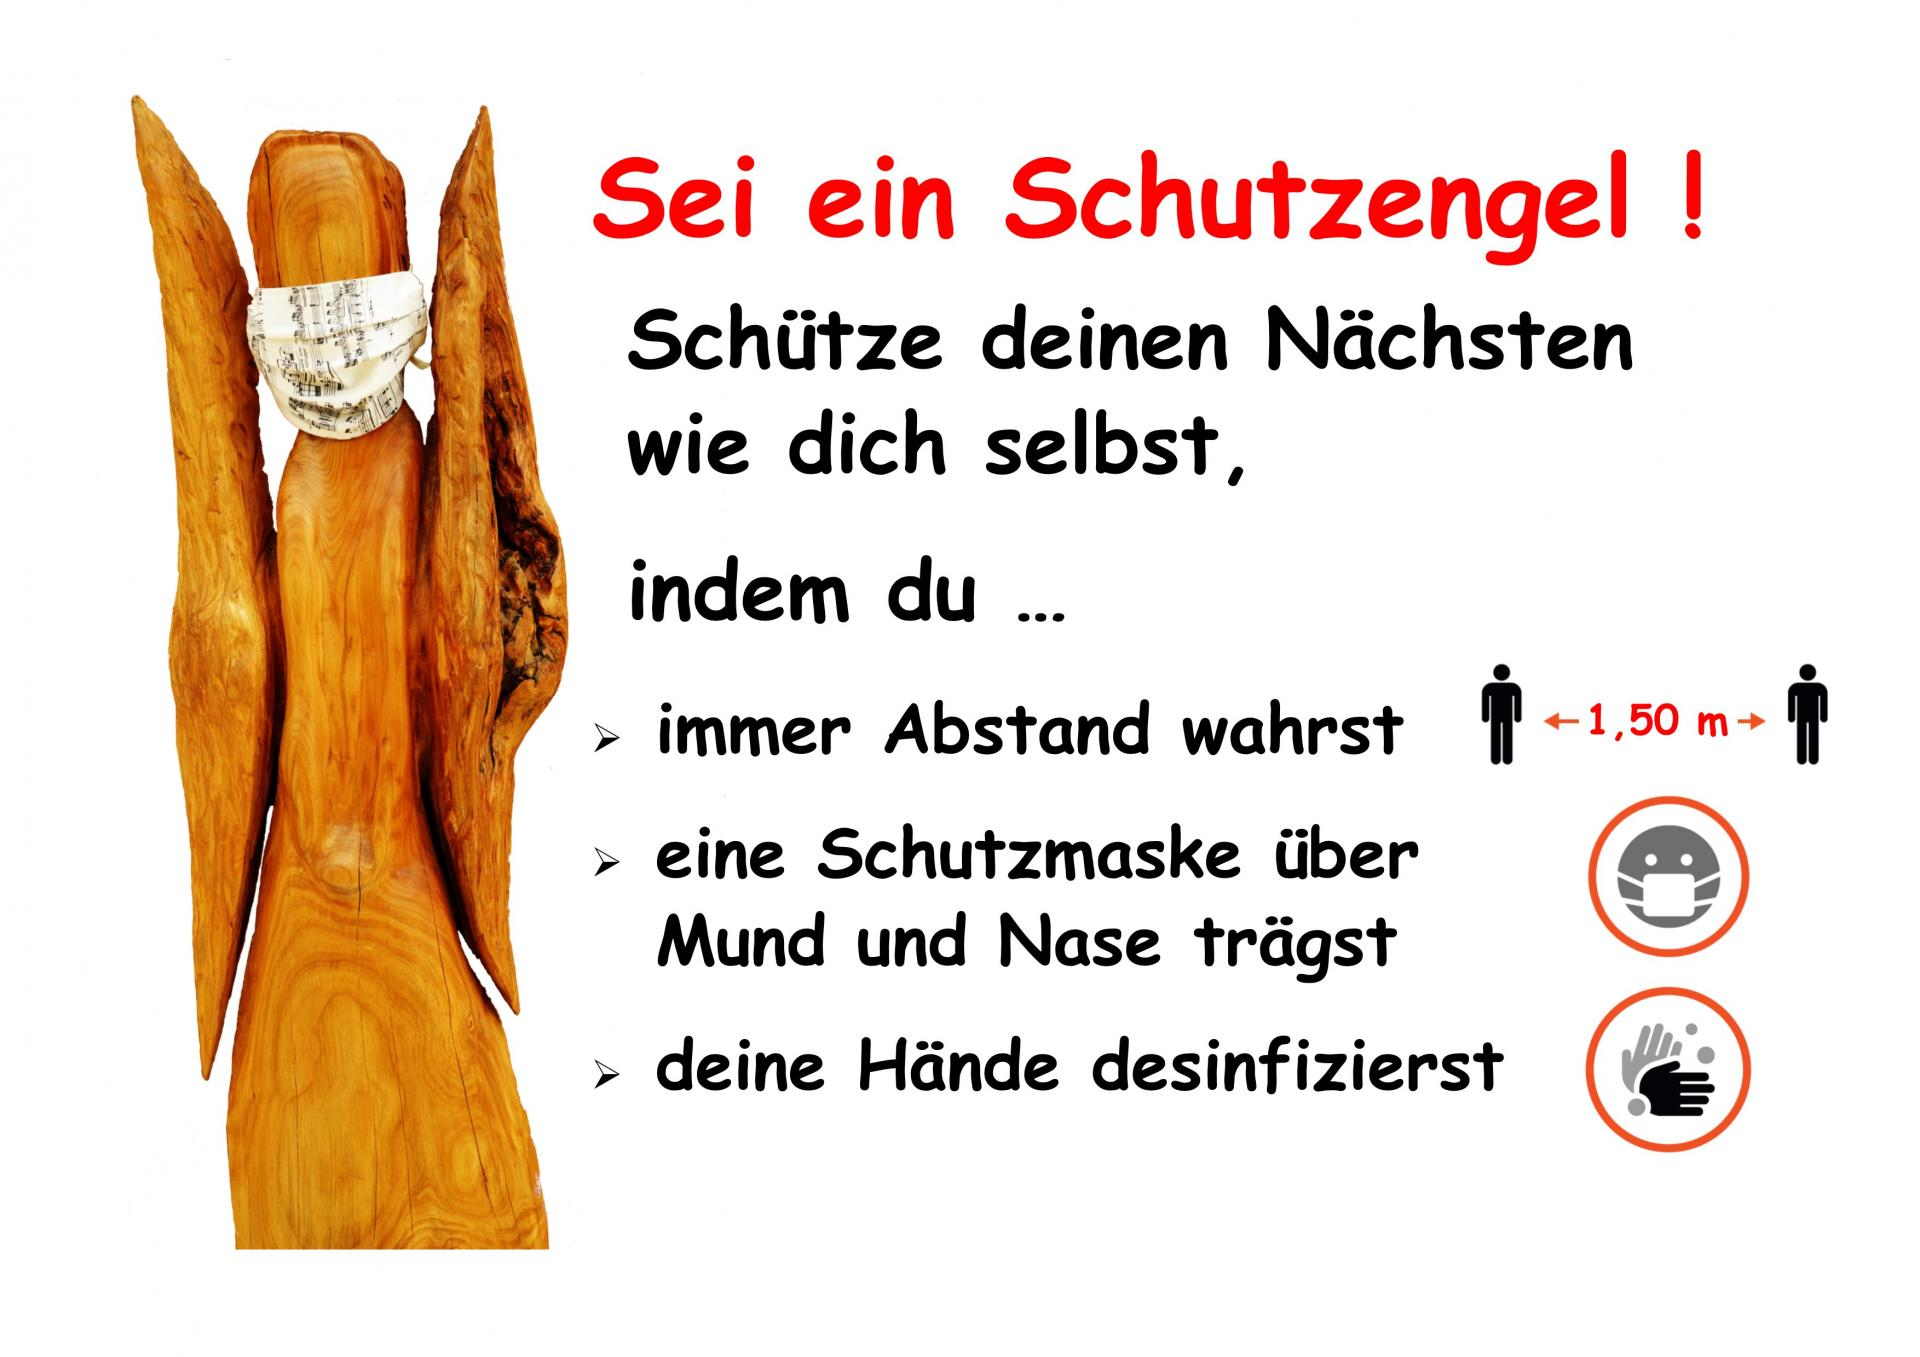 CoVid19-Hygiene Hinweis Schutzengel